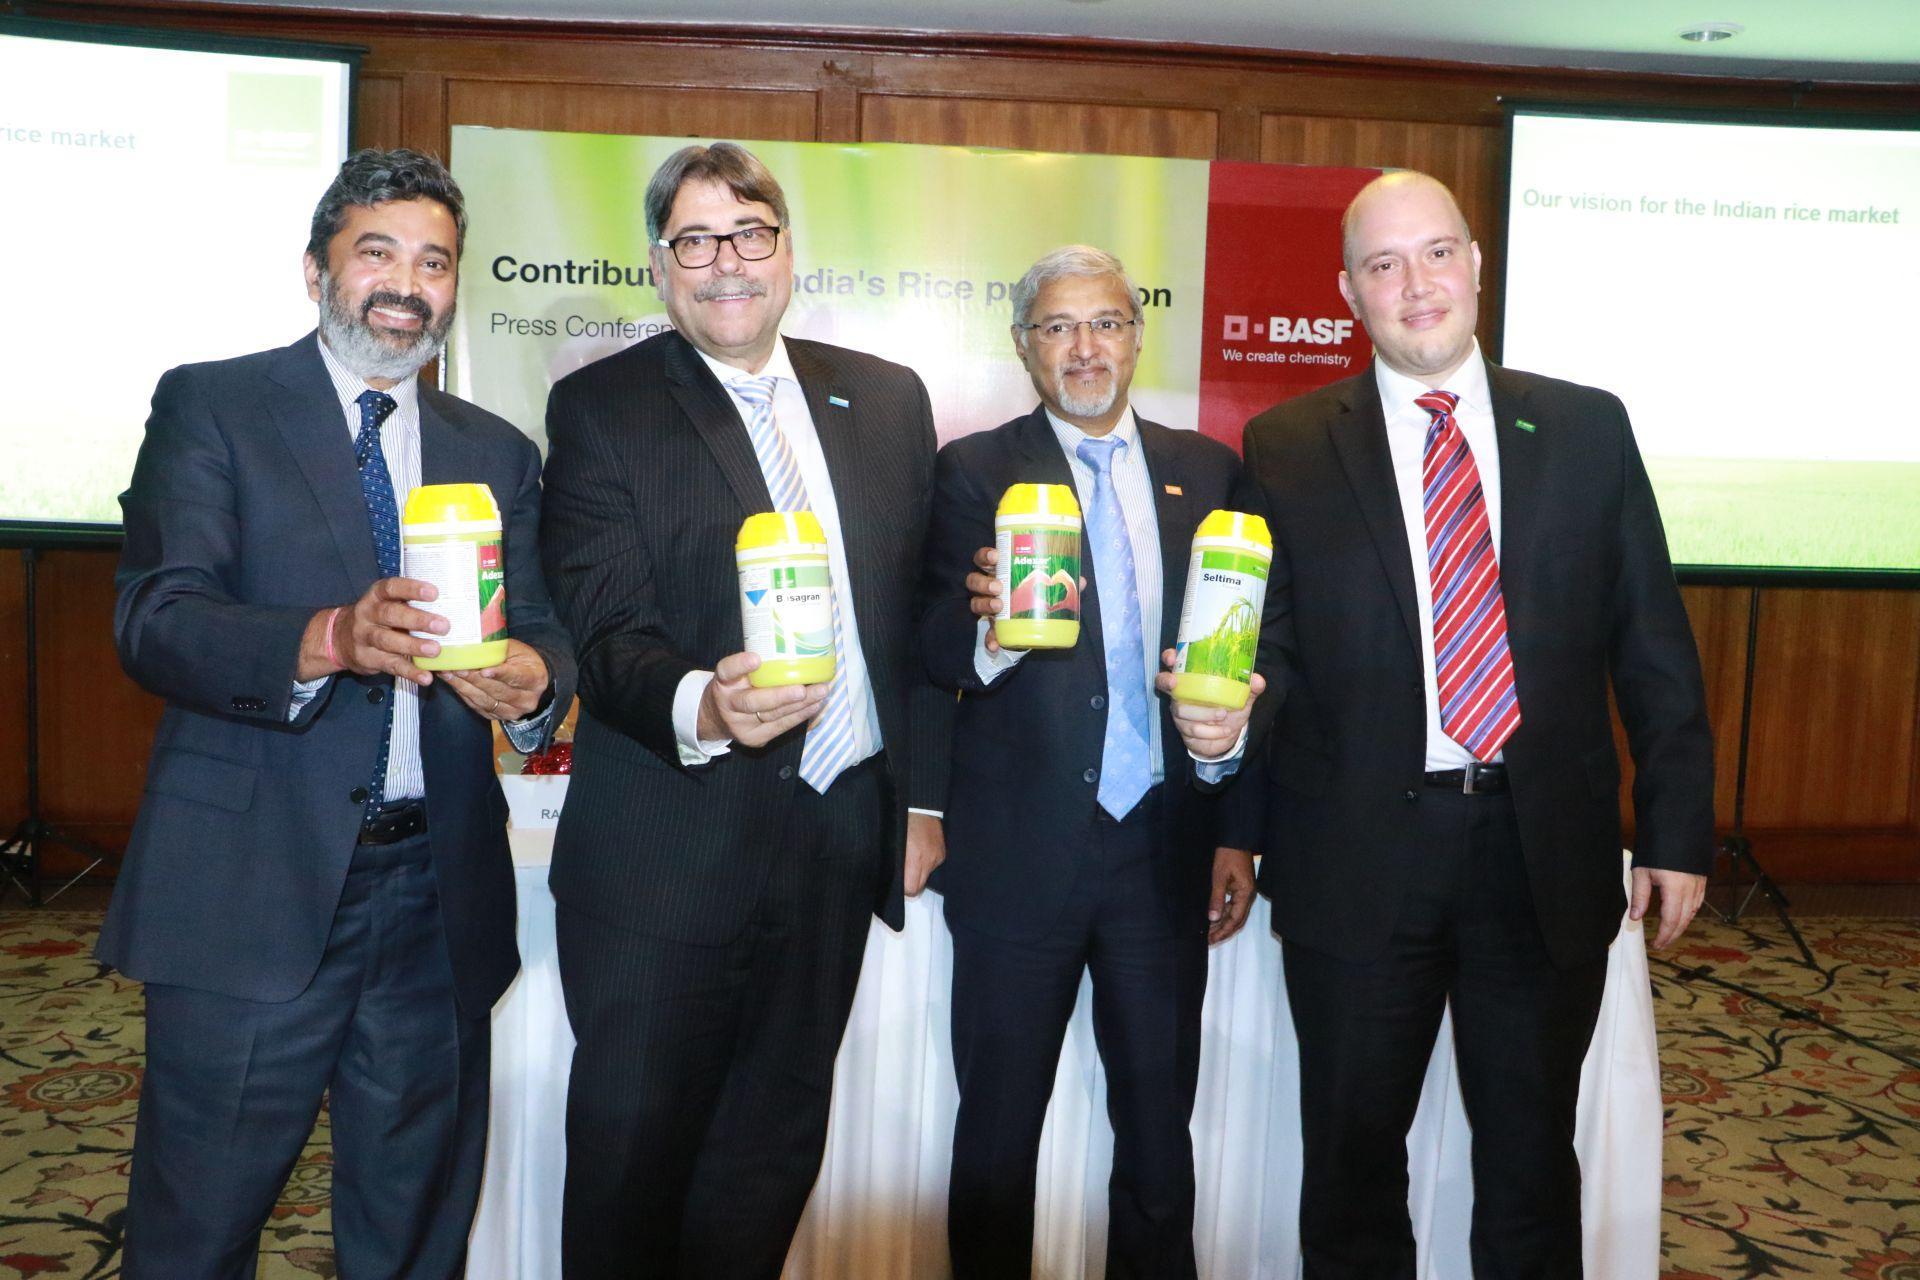 basf-enters-india-crop-protection-market-english.jpeg